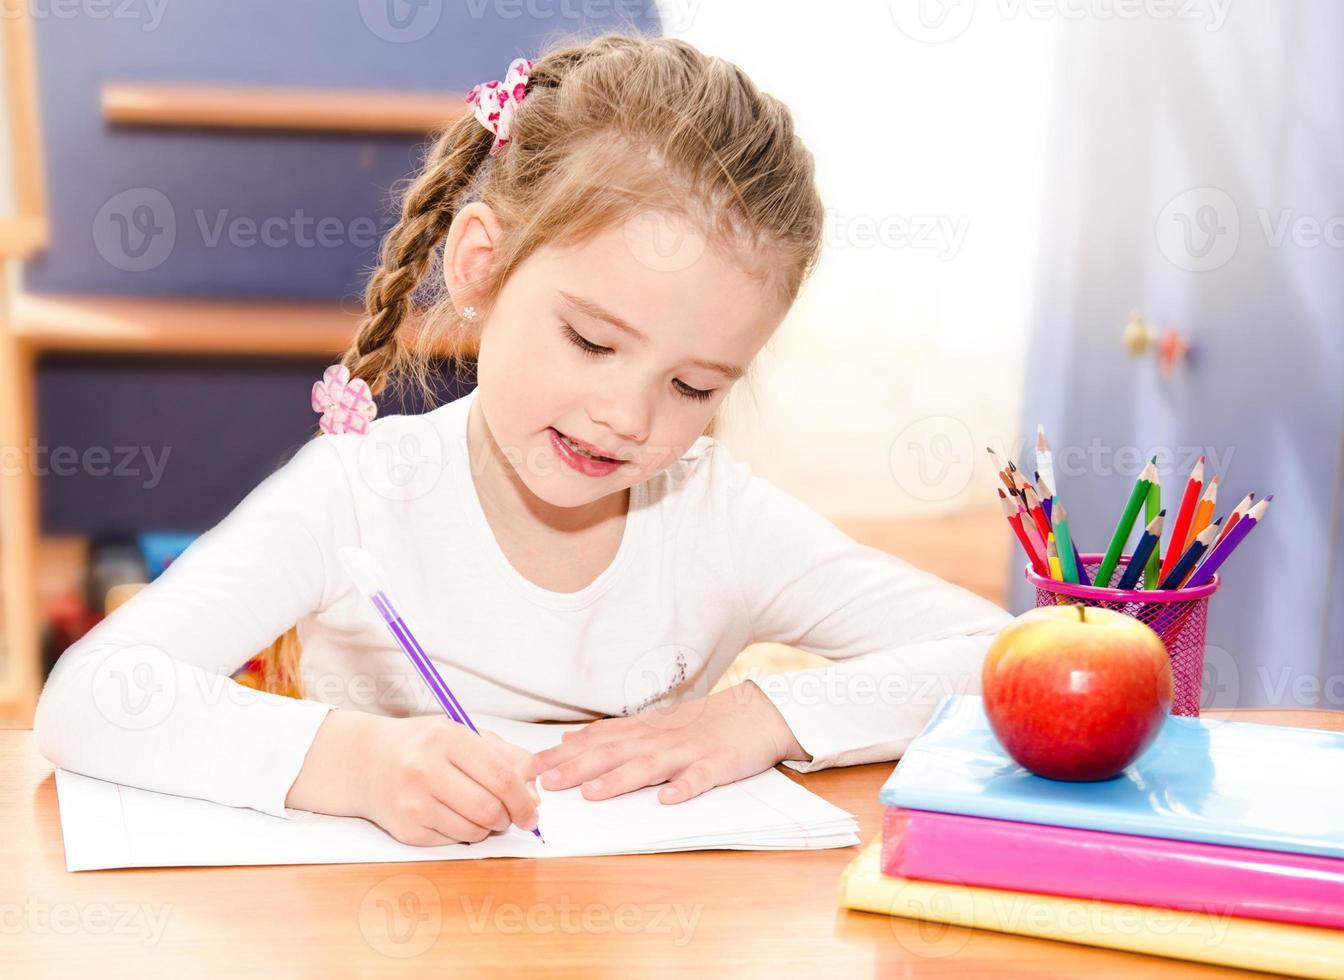 schattig lachend meisje schrijft aan de balie foto